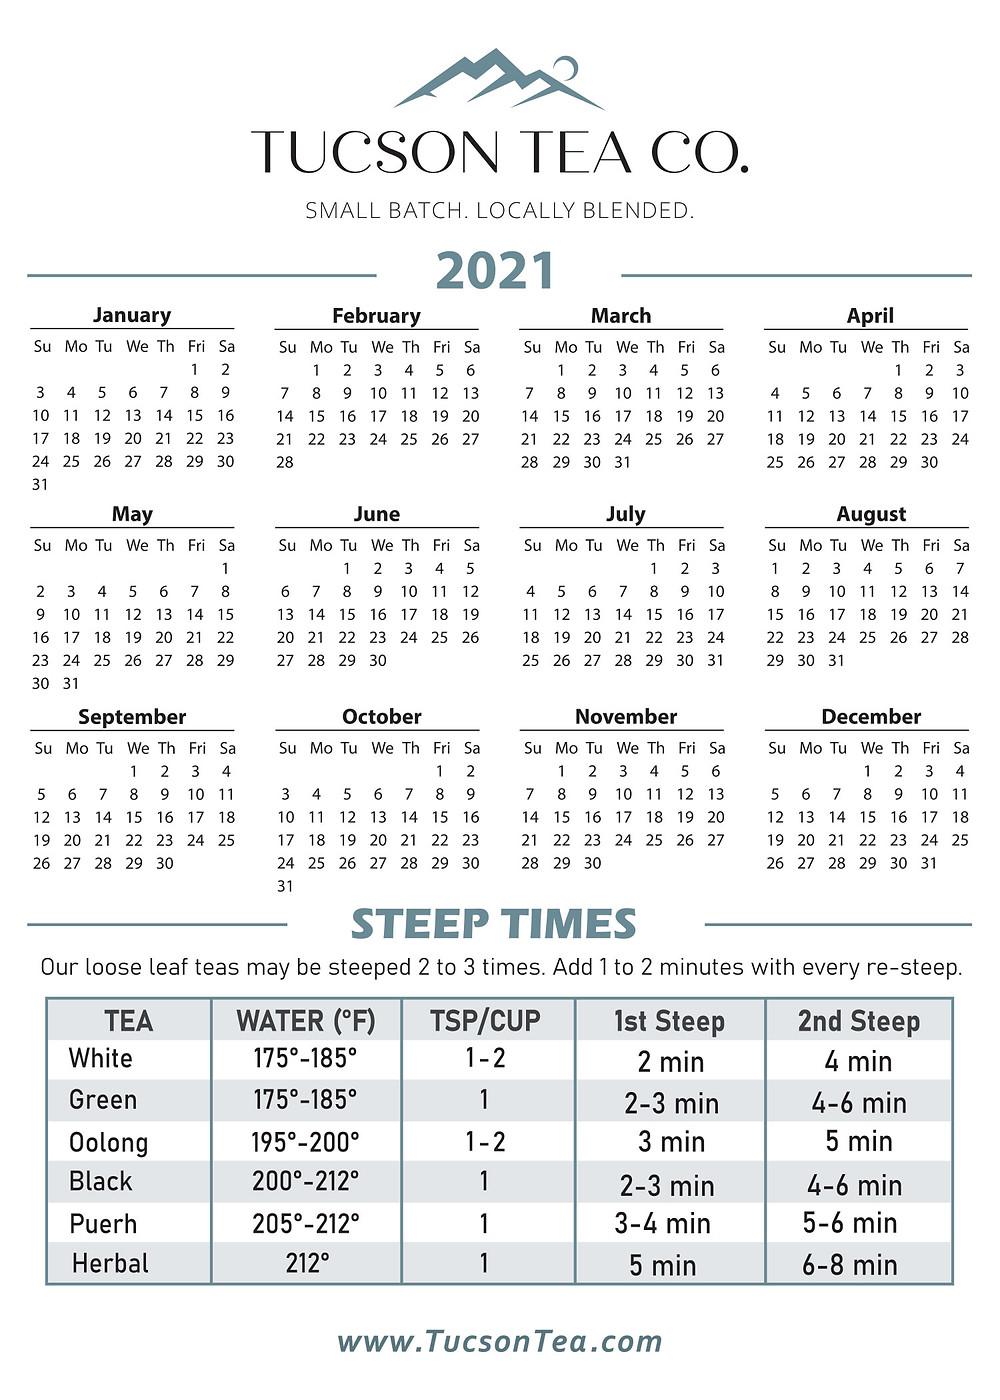 Tucson Tea Company Steeping Times Chart and Calendar